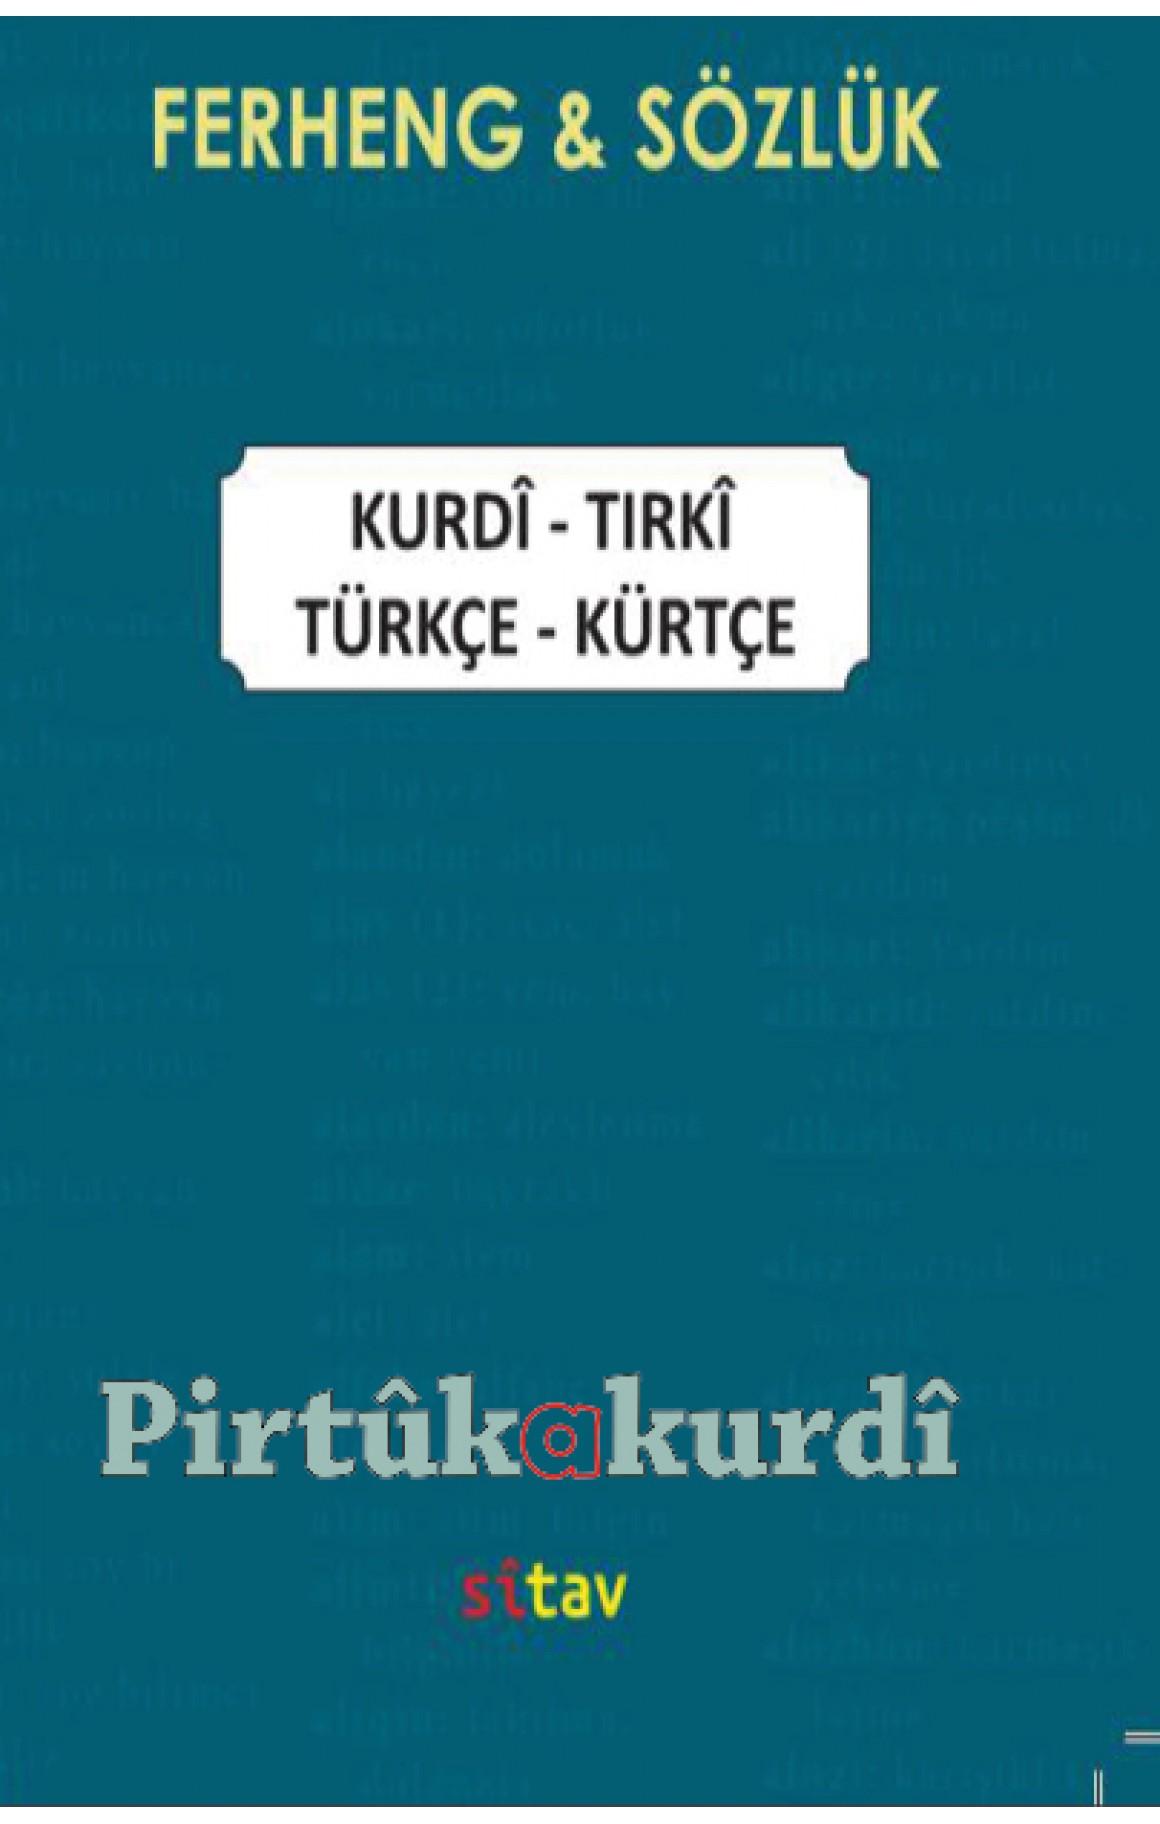 Ferheng Sözlük Türkçe Kürtçe- Kurdî Tirkî